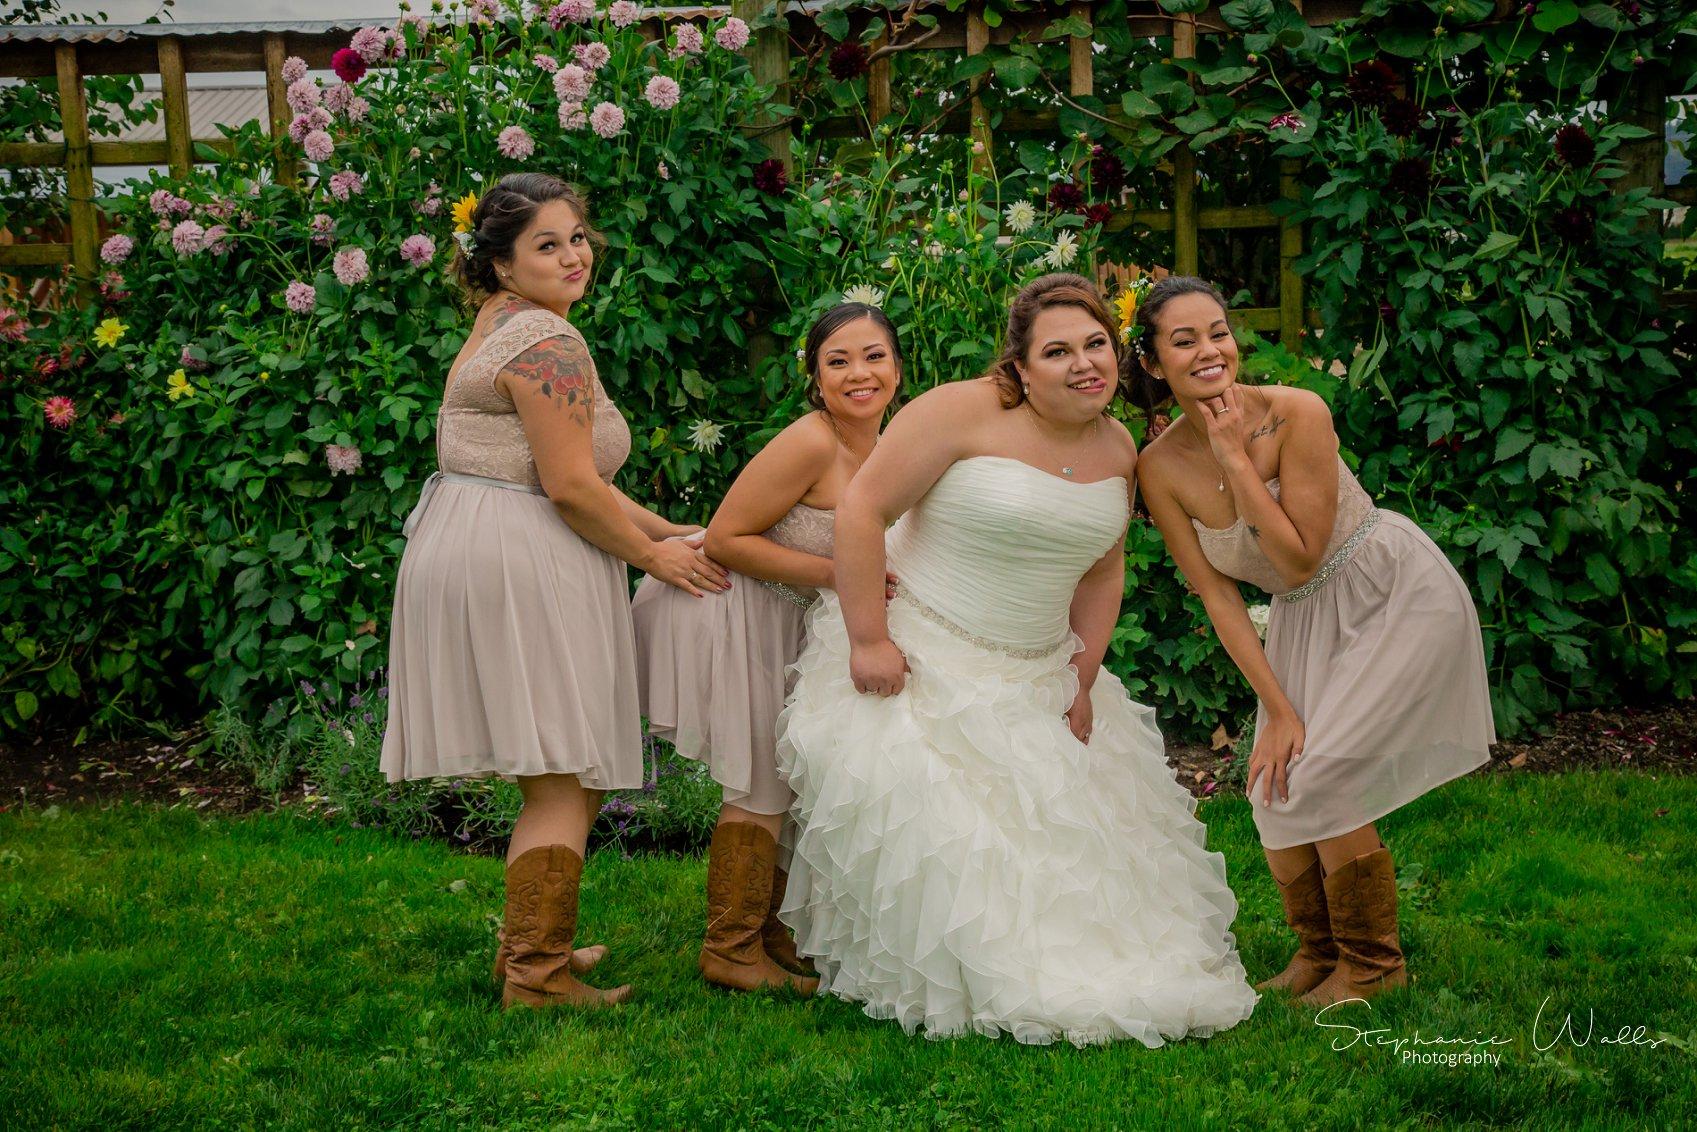 Kimble Wedding 077 1 Marlena & Allans | Snohomish Red Barn Events (Stocker Farms) | Snohomish, Wa Wedding Photographer